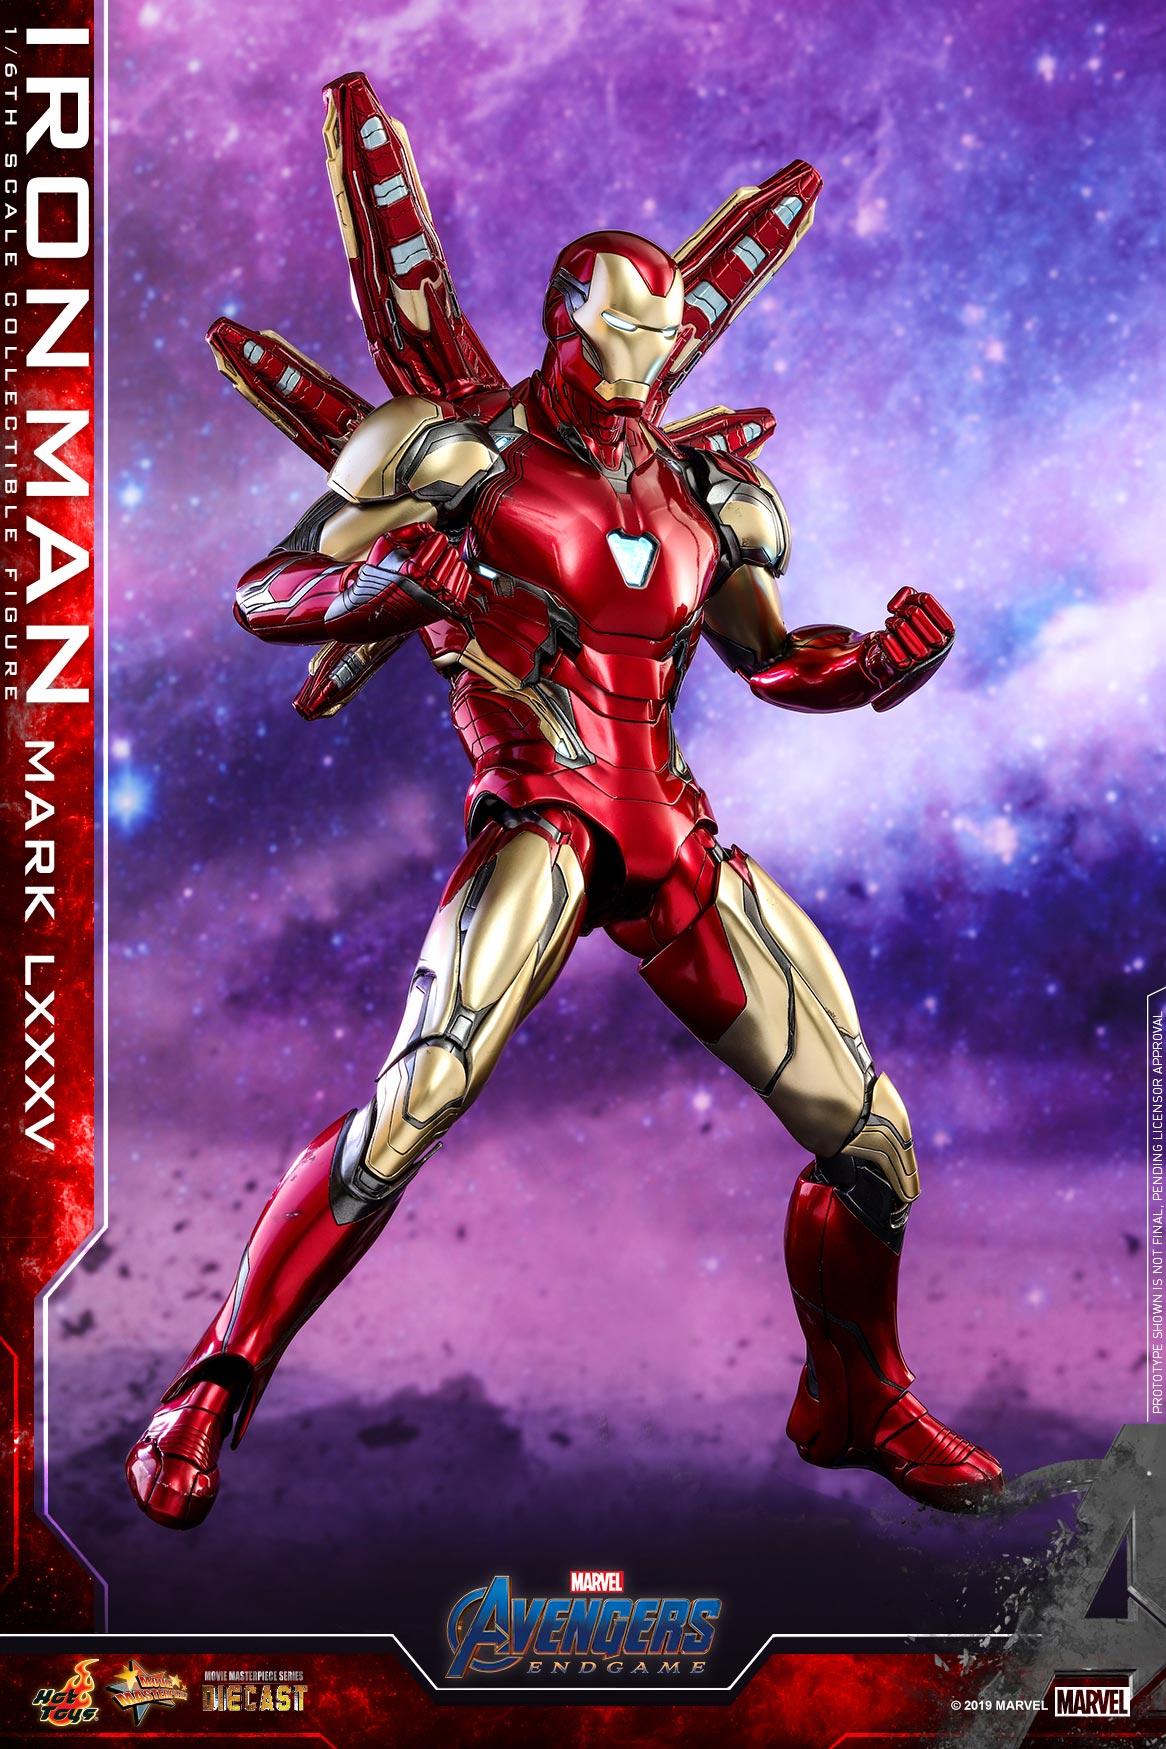 Hot-Toys---Avengers-4---Iron-Man-Mark-LXXXV-collectible-figure_PR10